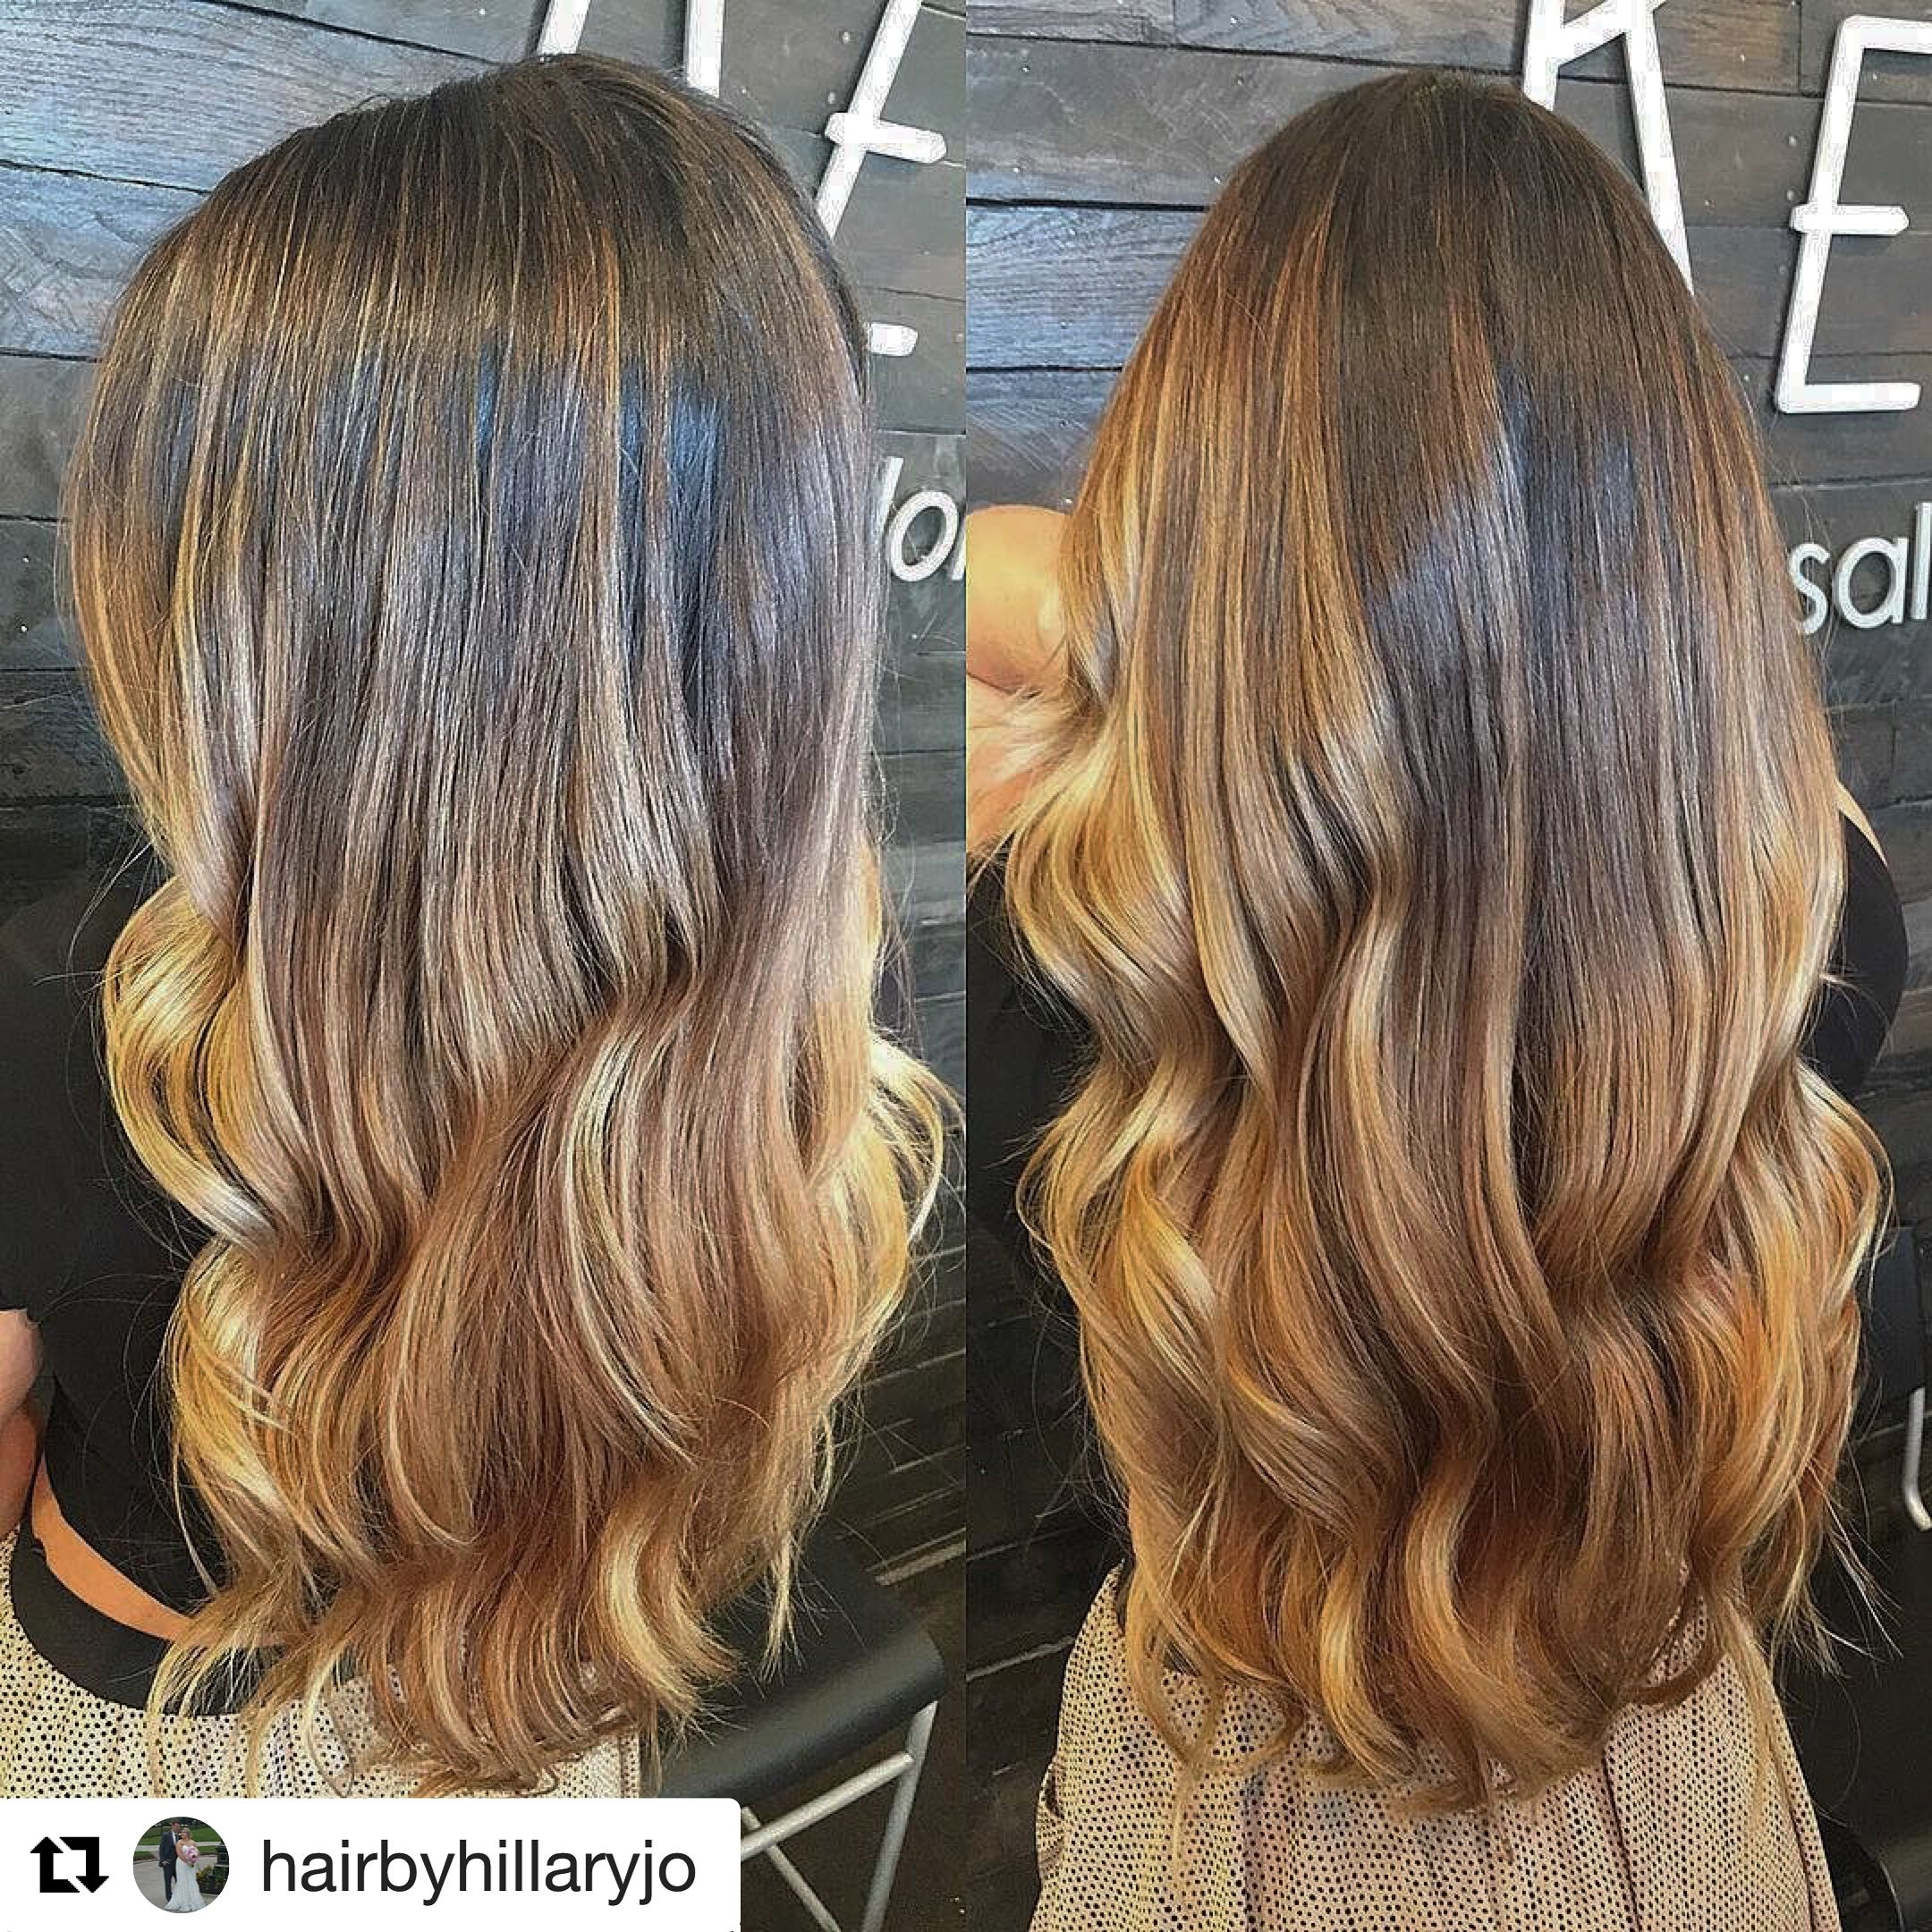 Long Hair Balayage Done By Our Talented Hillary Reveal Salon And Spa Omaha Ne Balayage Hair Long Hair Styles Hair